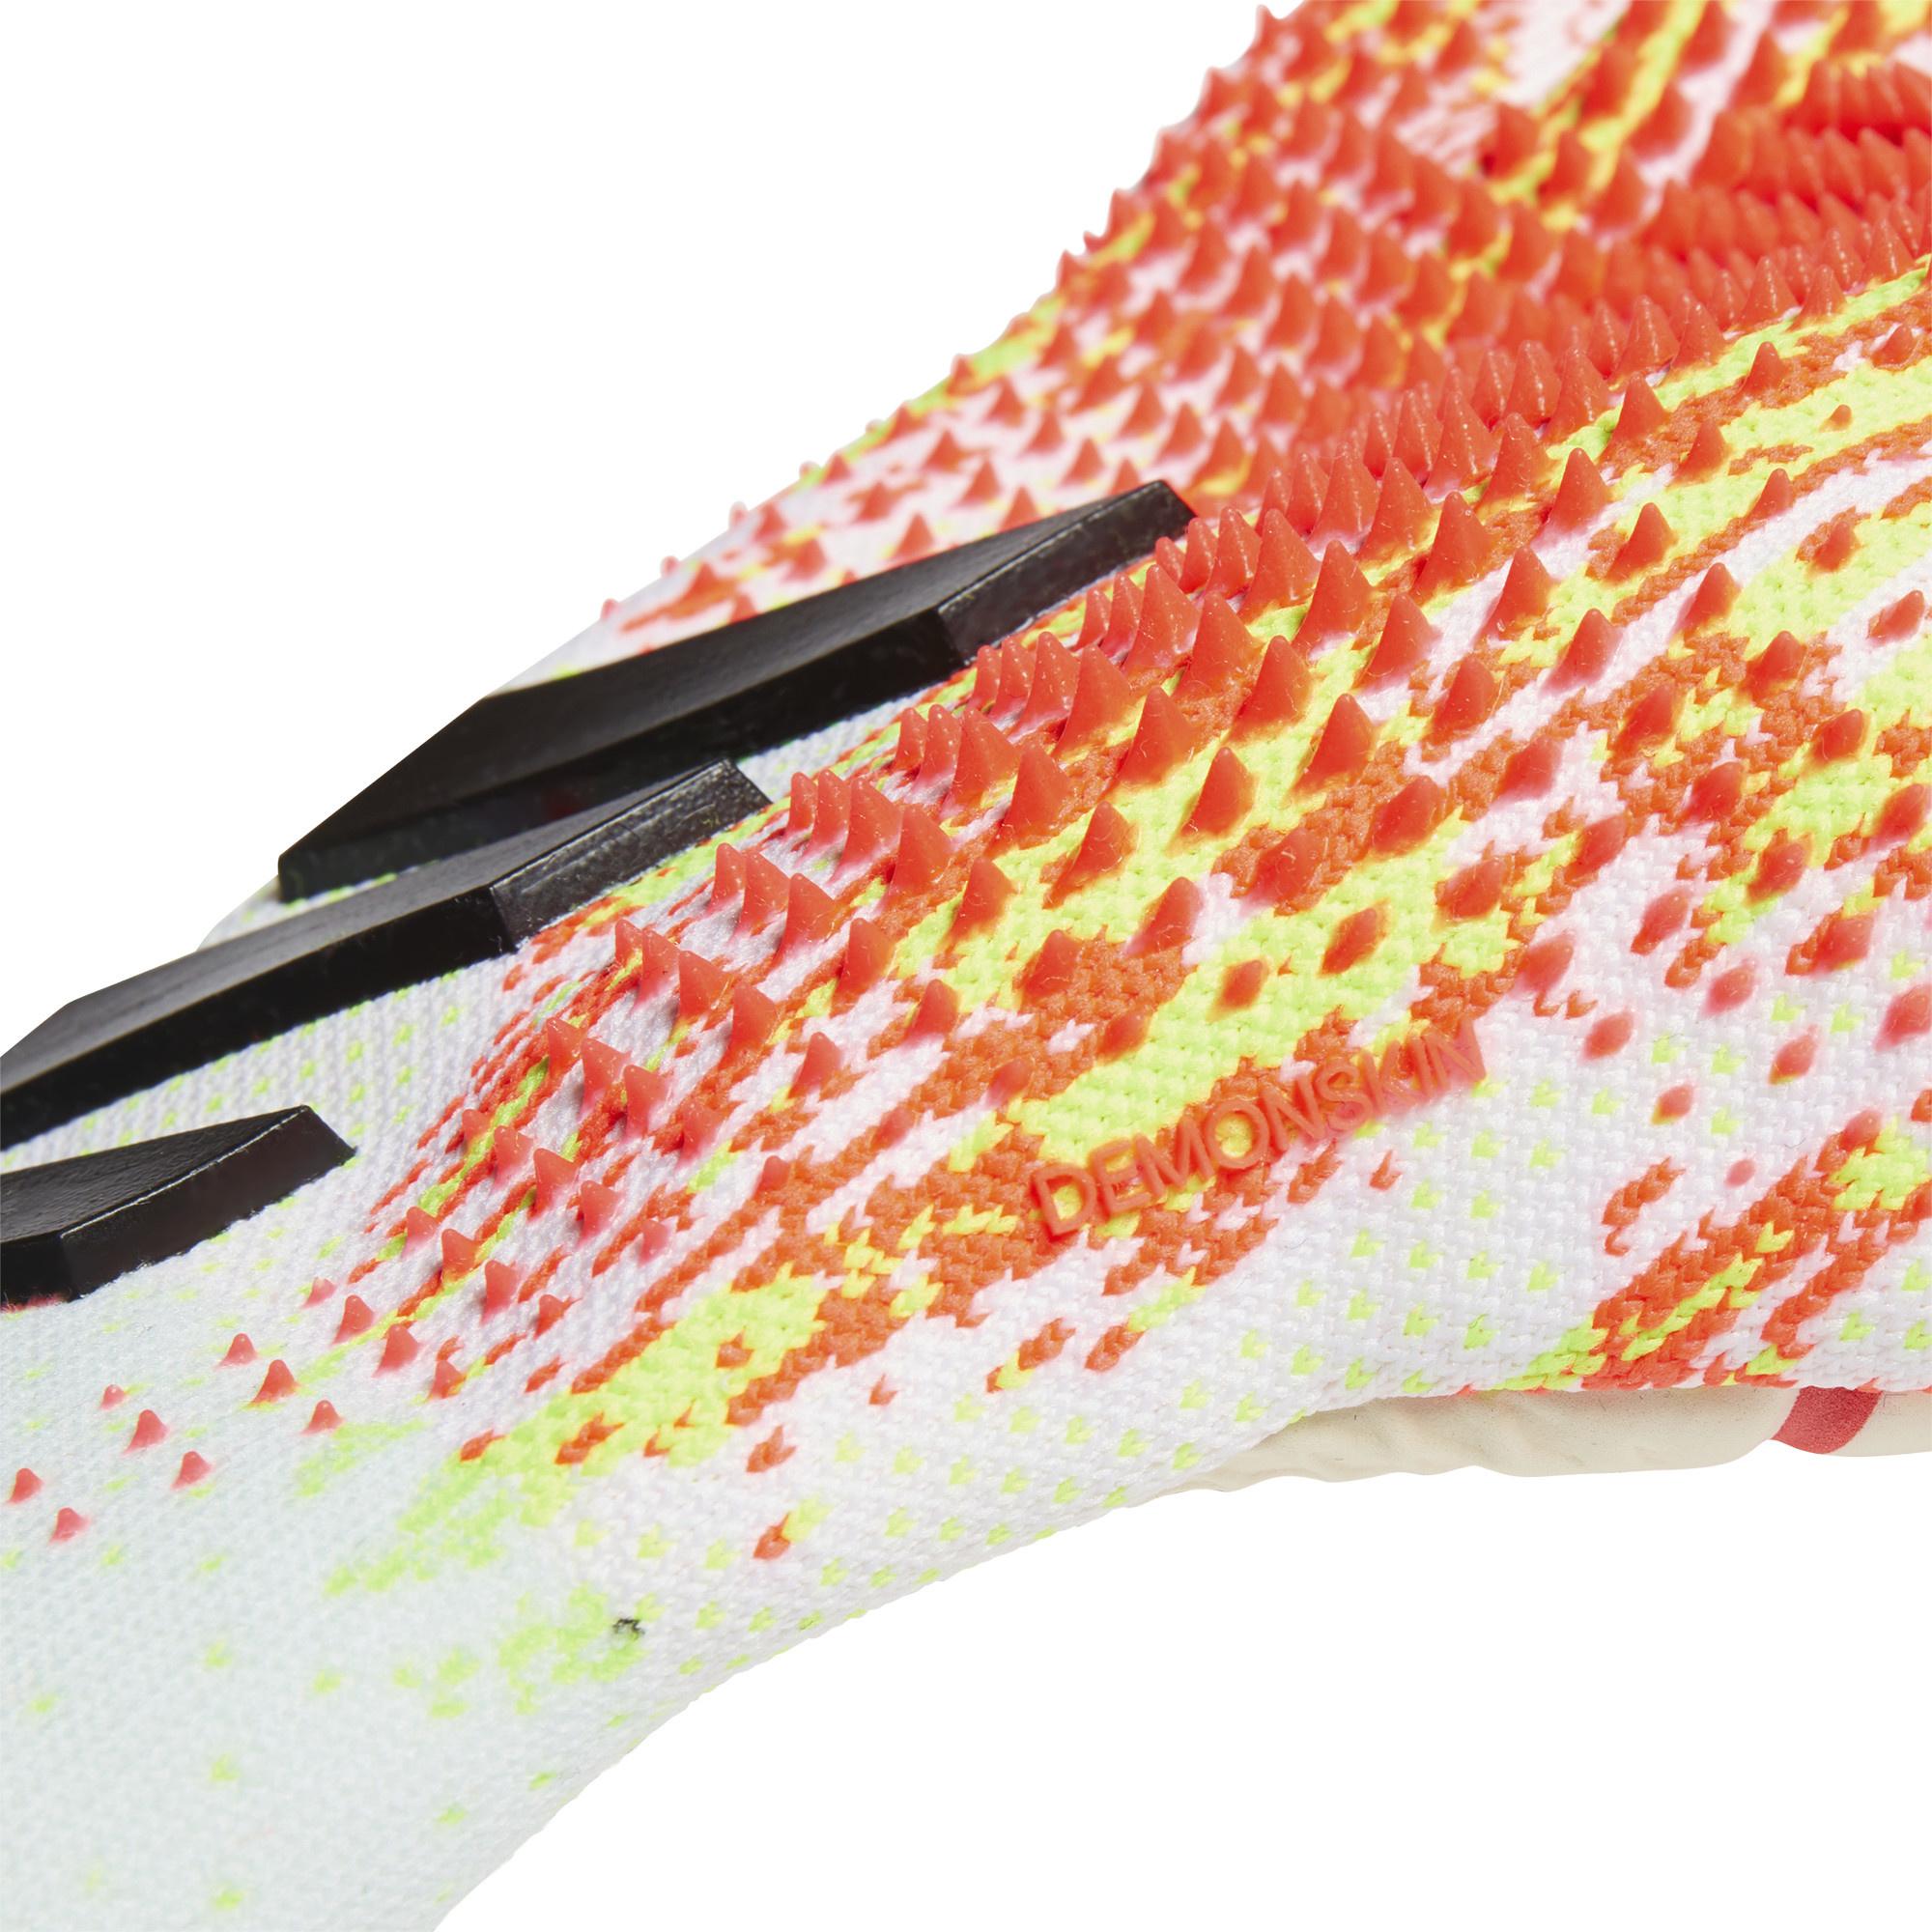 Adidas ADIDAS Predator Pro Keeperhandschoen